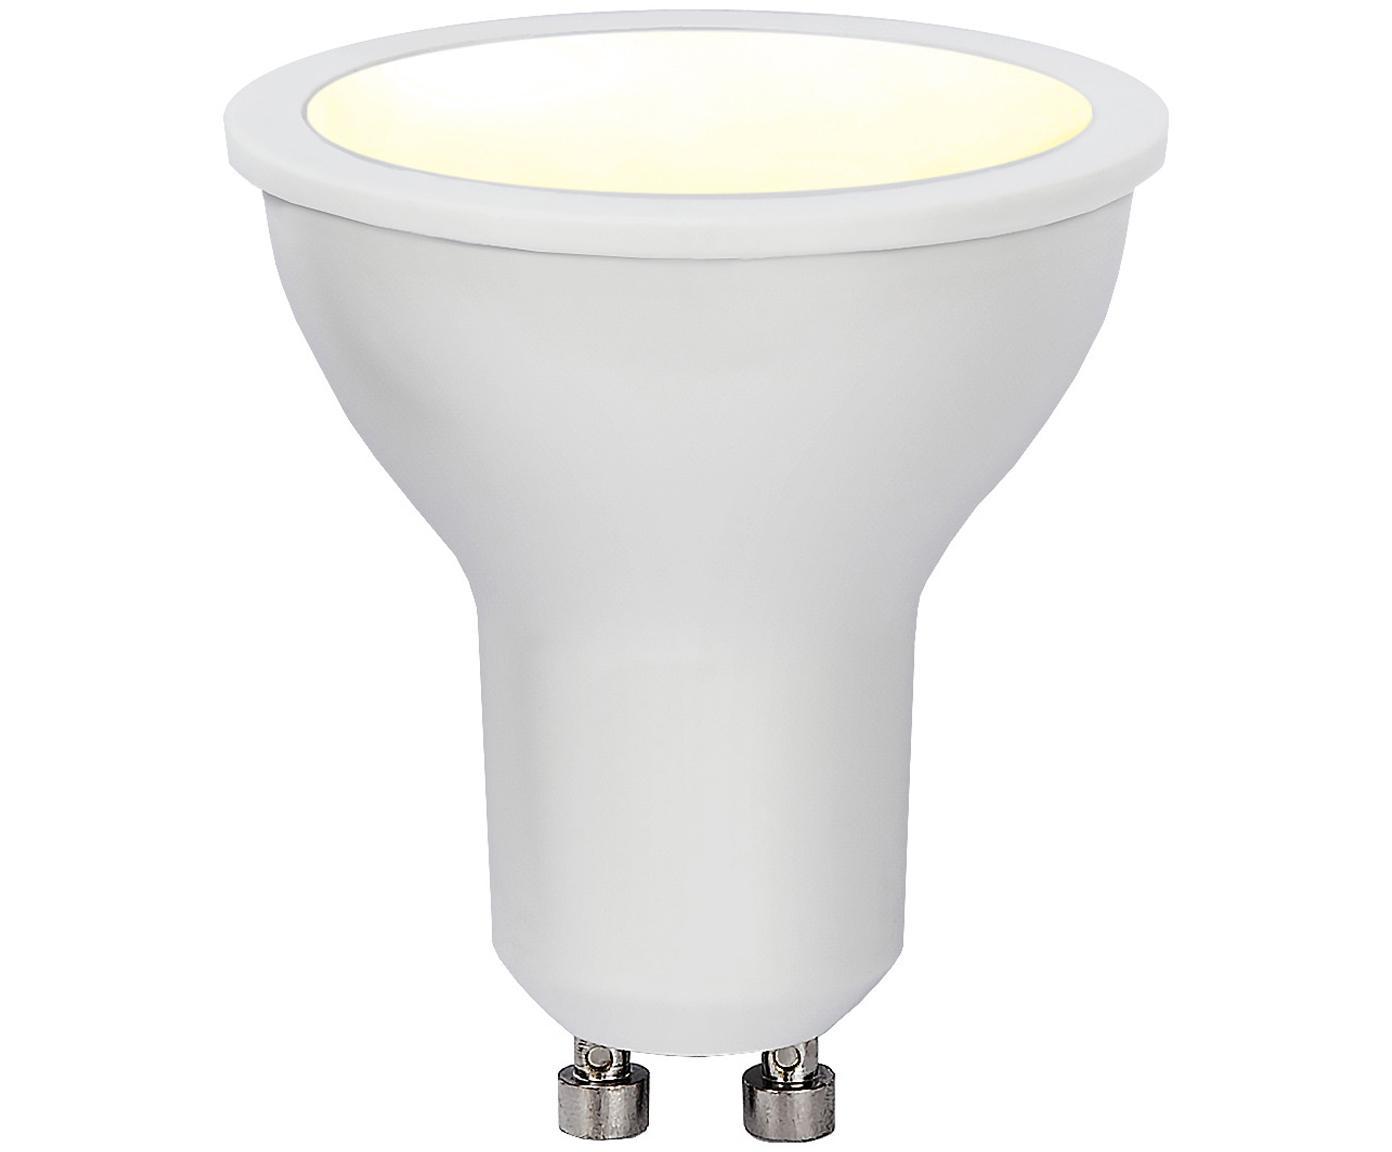 Lampadina a LED dimmerabile Dim To Warm (GU10 / 5,5Watt), Paralume: materiale sintetico, Base lampadina: alluminio, Bianco, Ø 5 x Alt. 6 cm